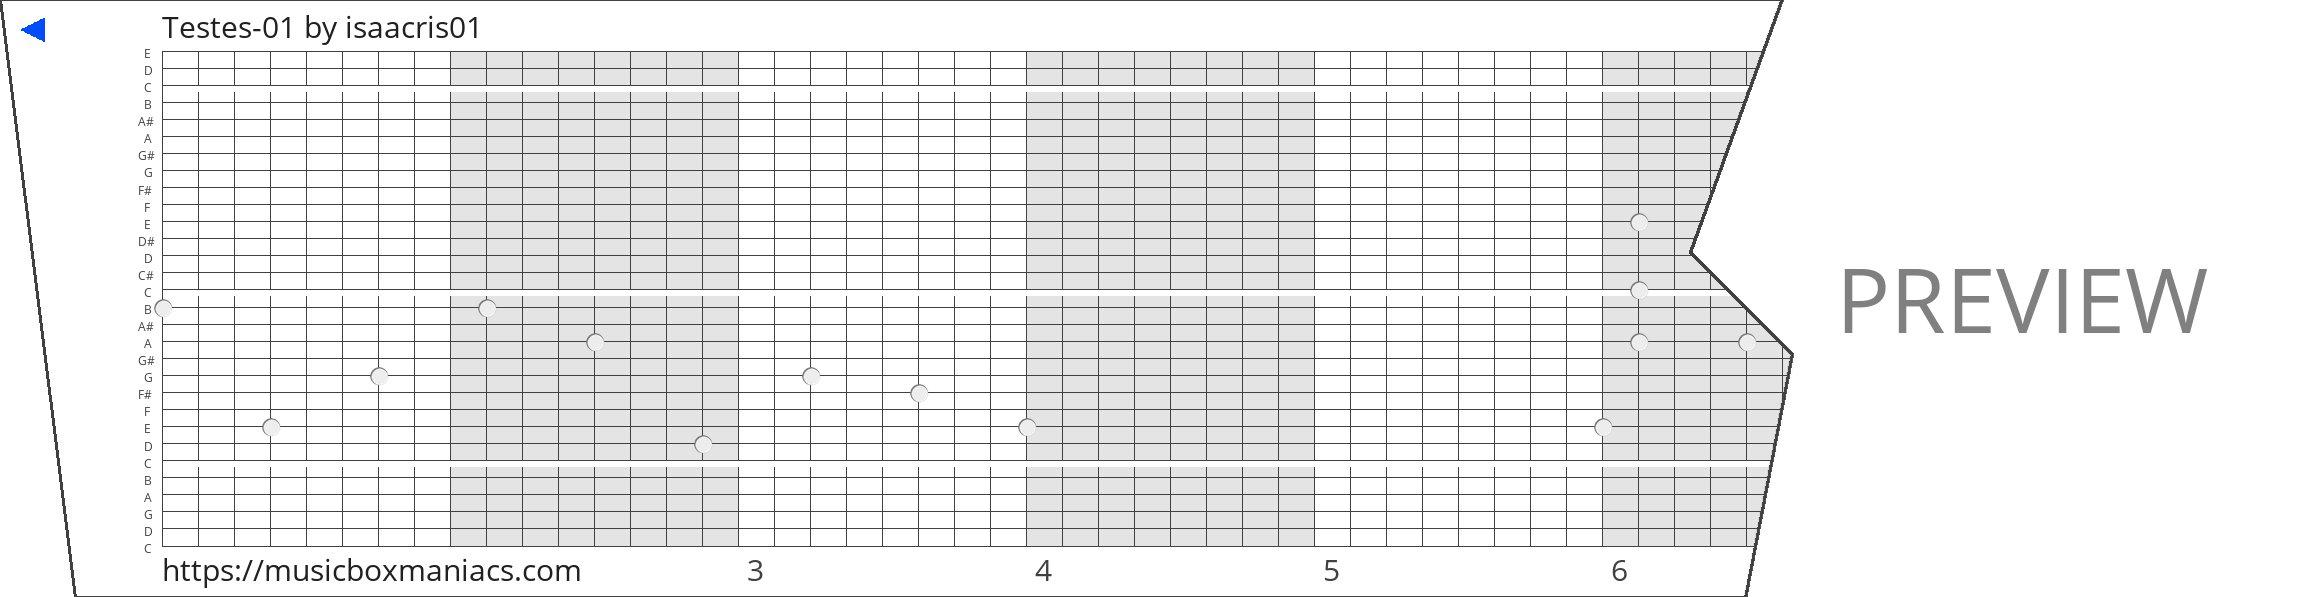 Testes-01 30 note music box paper strip